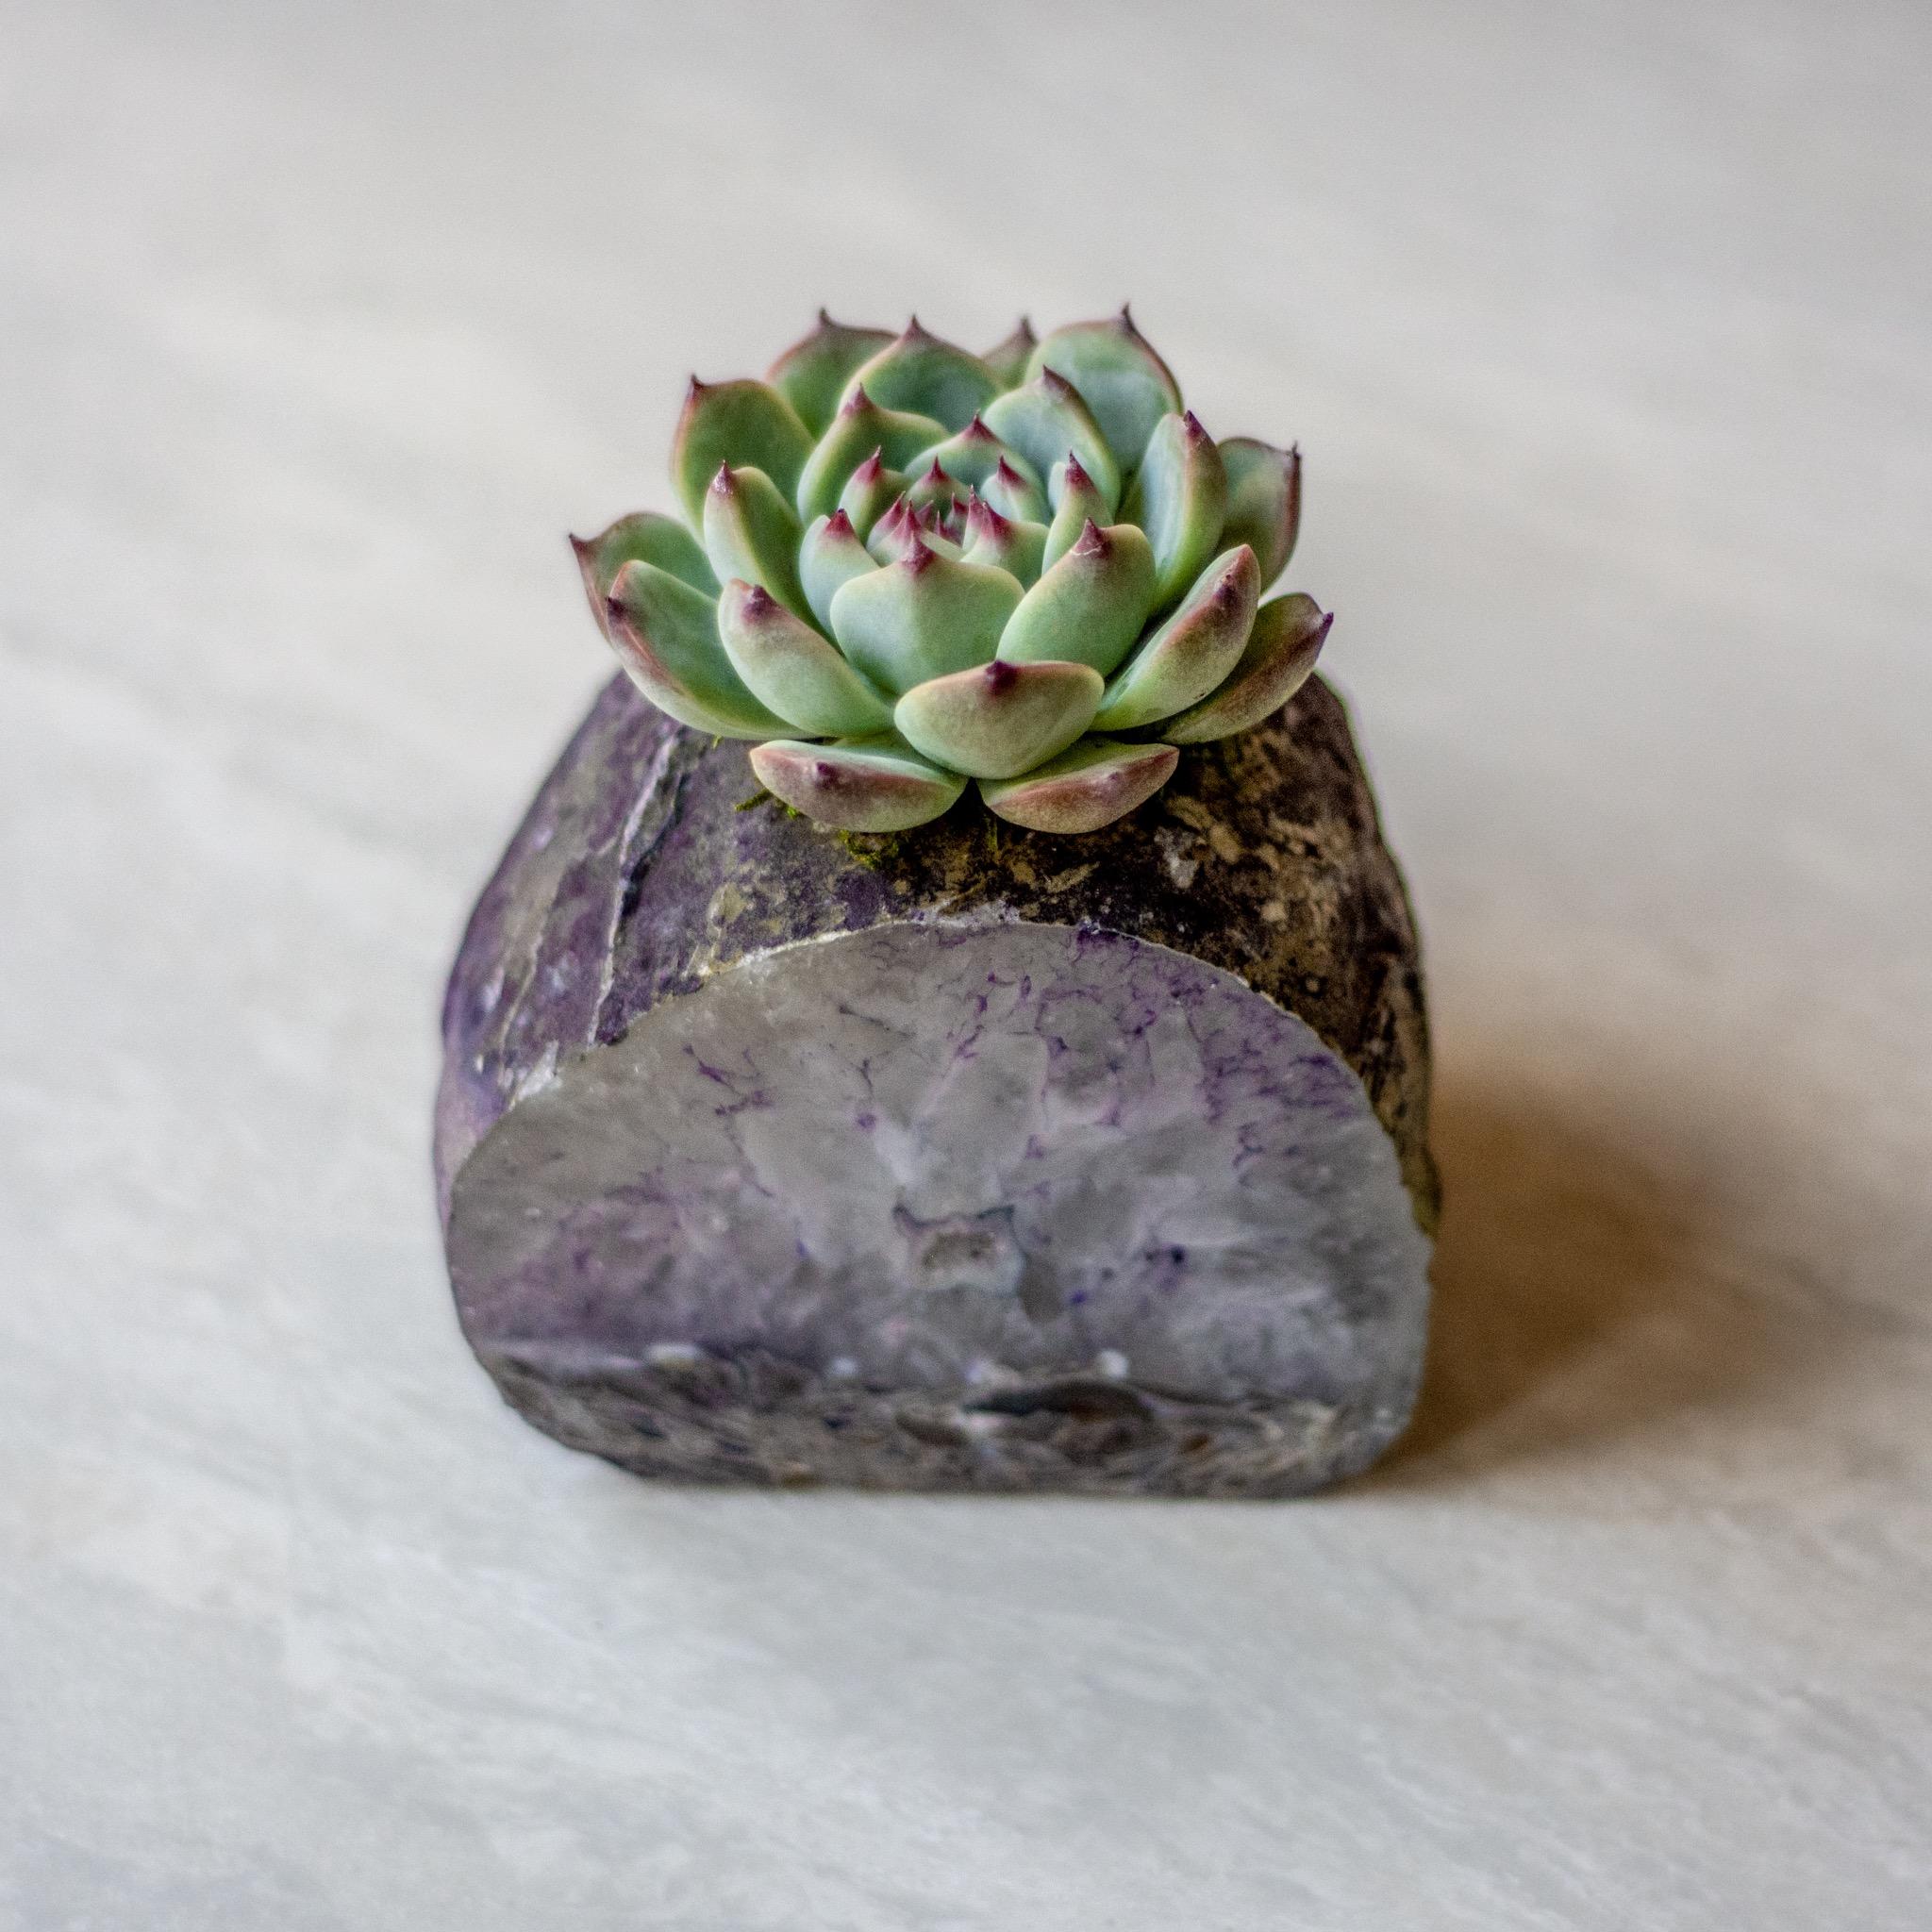 infinitesucculent_crystals_ccbiz_gabaccia__GAB5868.jpg